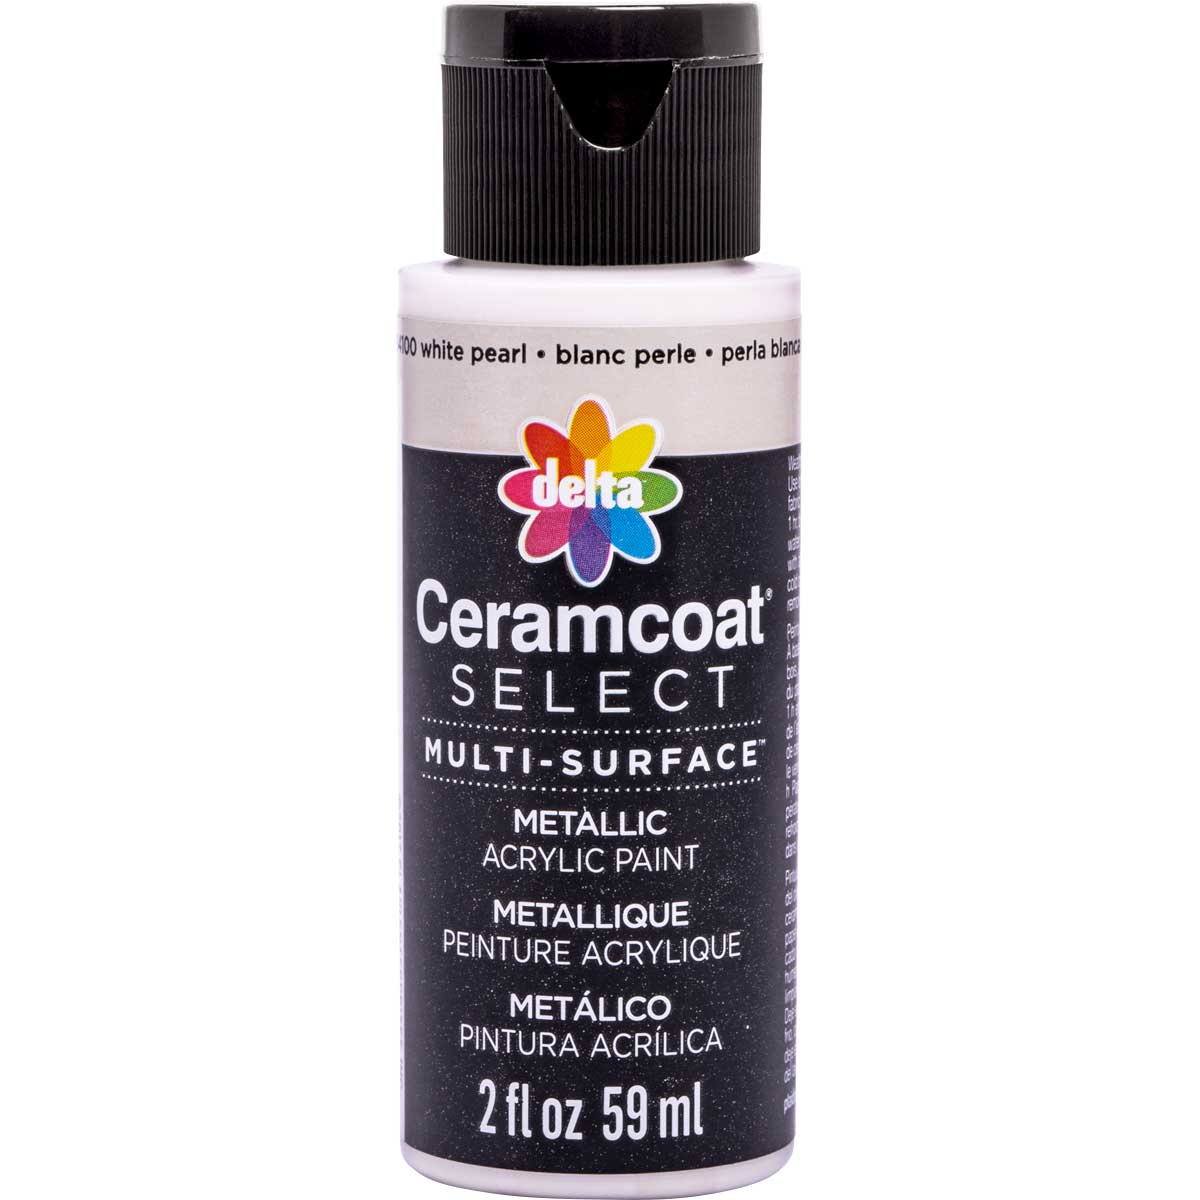 Delta Ceramcoat ® Select Multi-Surface Acrylic Paint - Metallic - White Pearl, 2 oz.